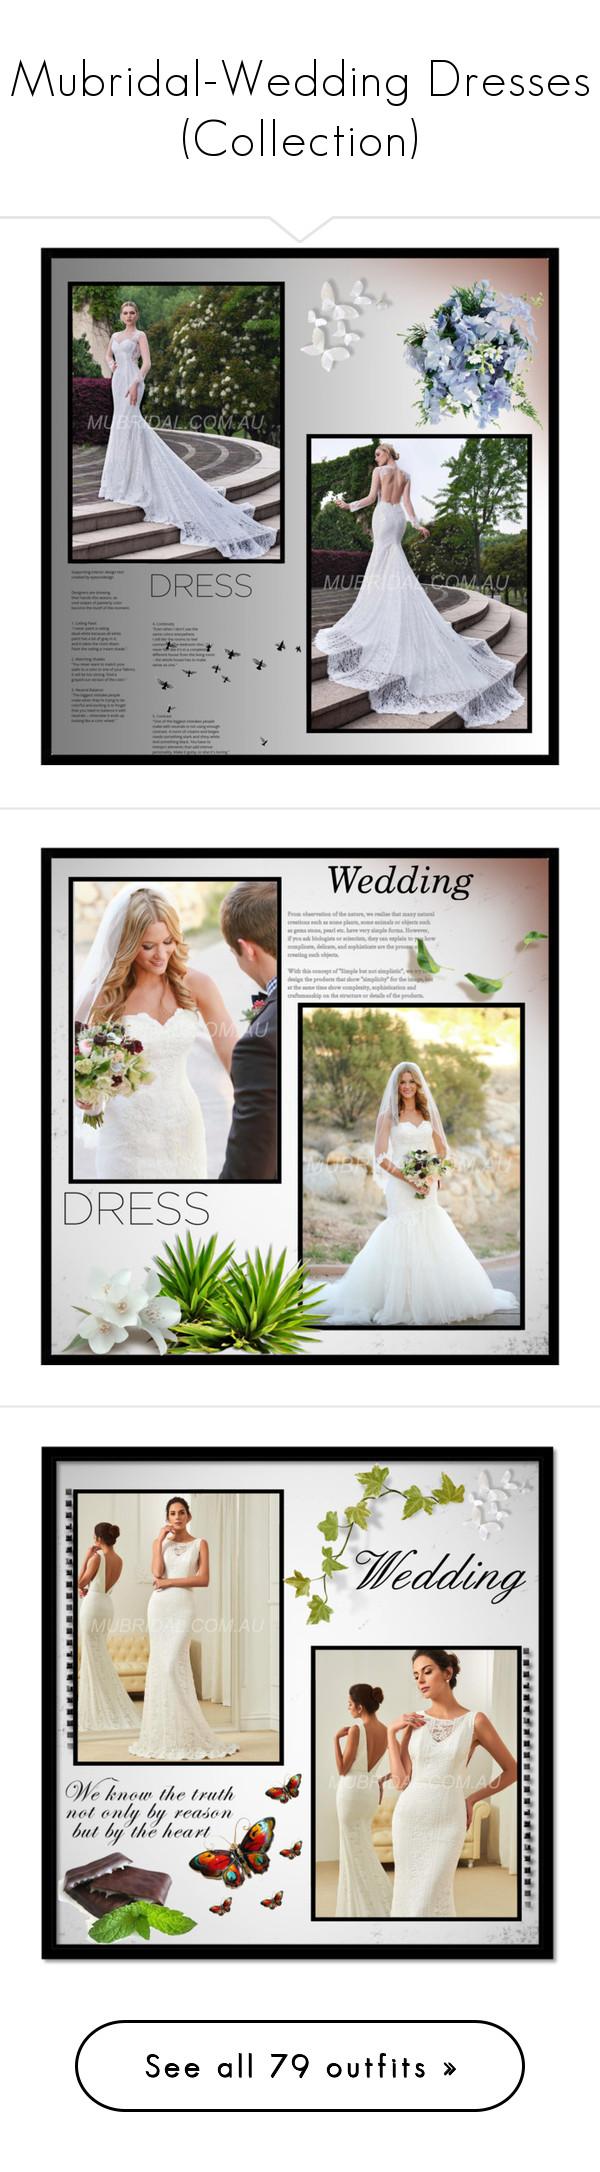 Mubridalwedding dresses collection